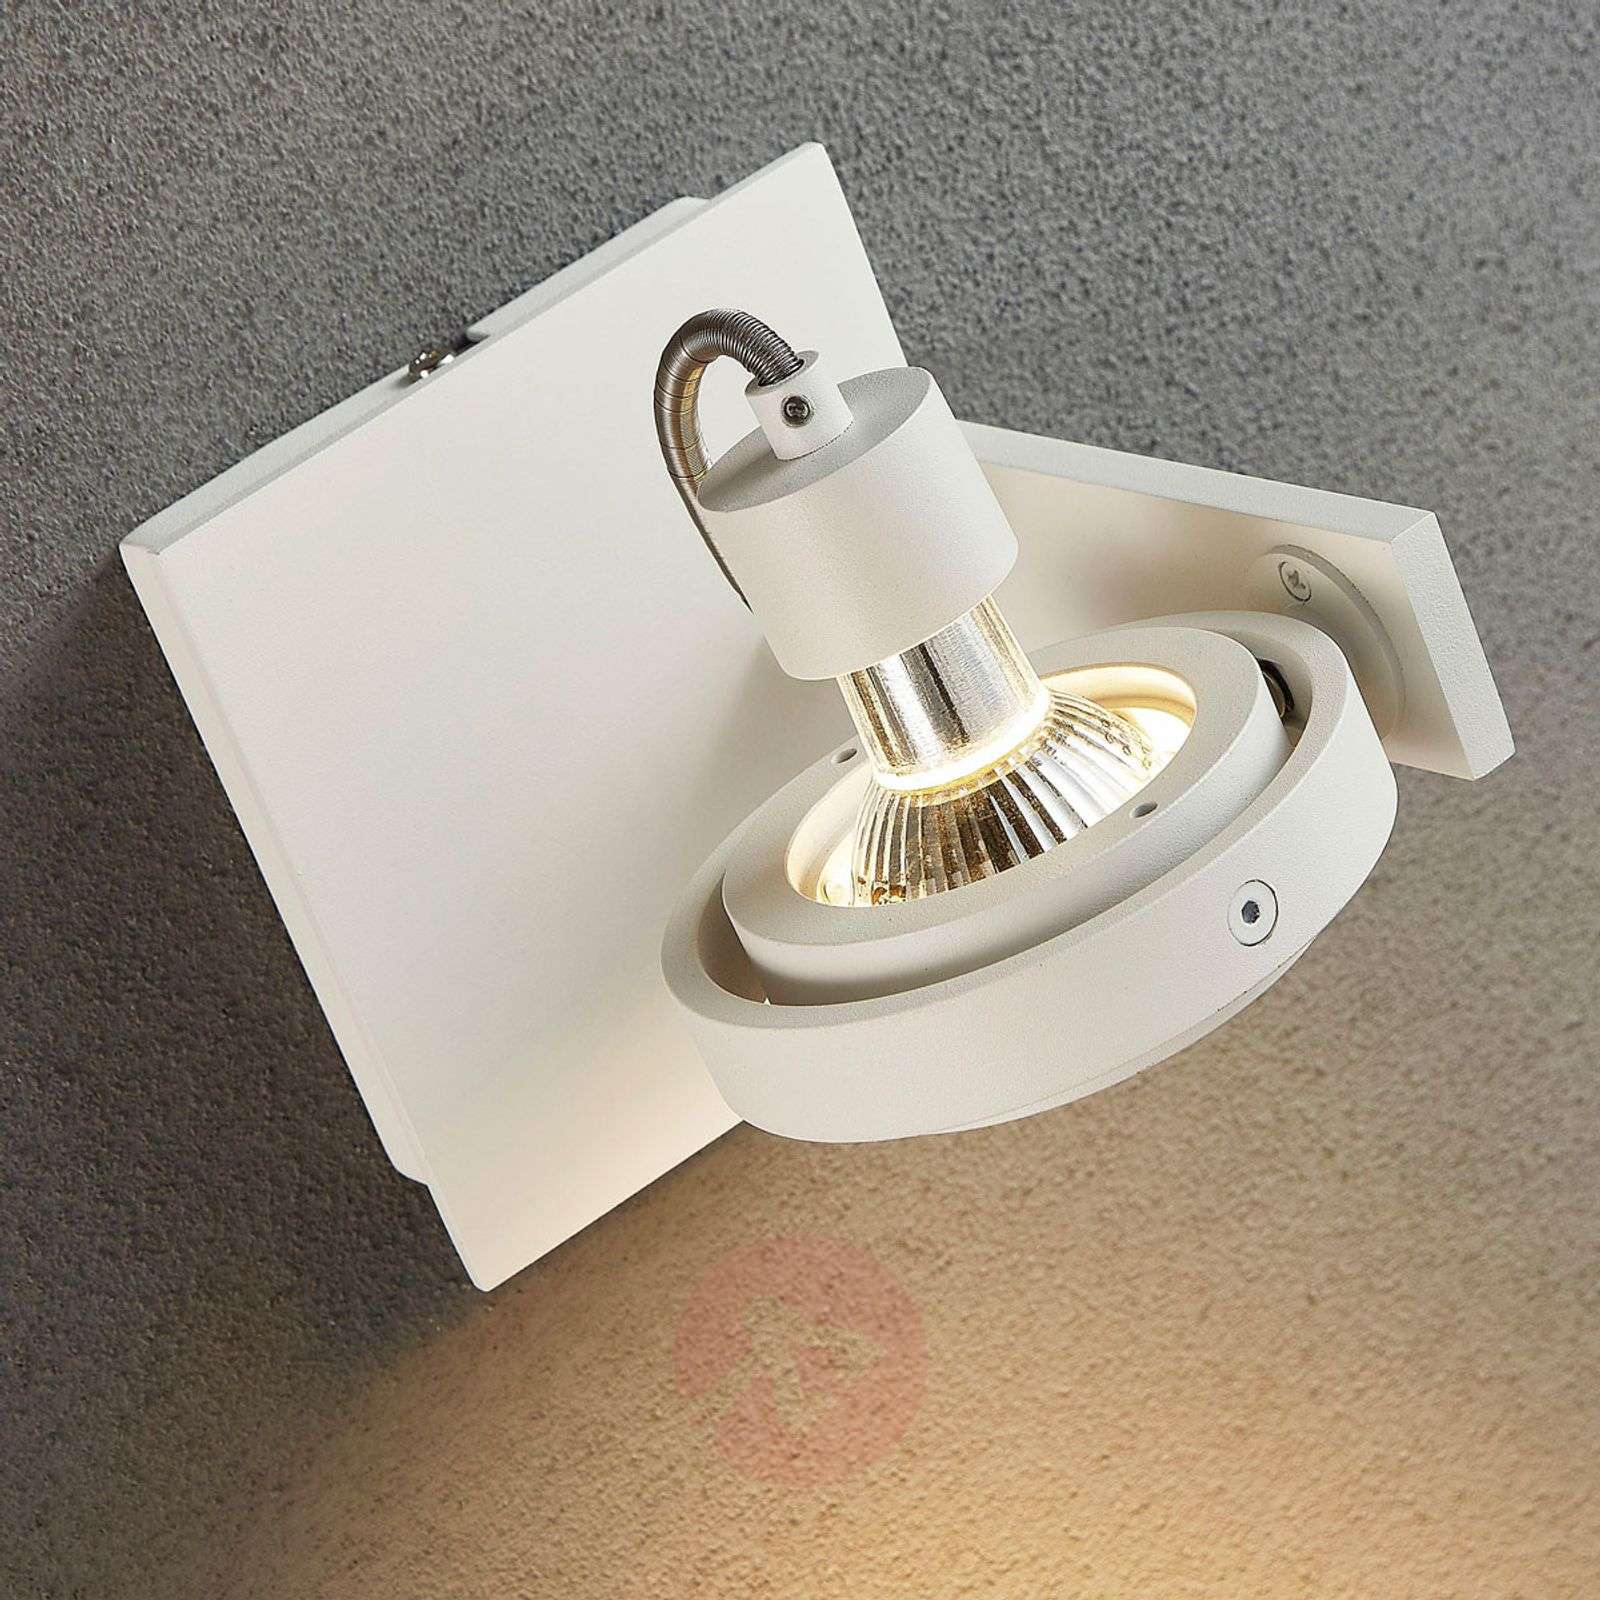 Teska valkoinen kohdevalo GU10-LED-9621408-011